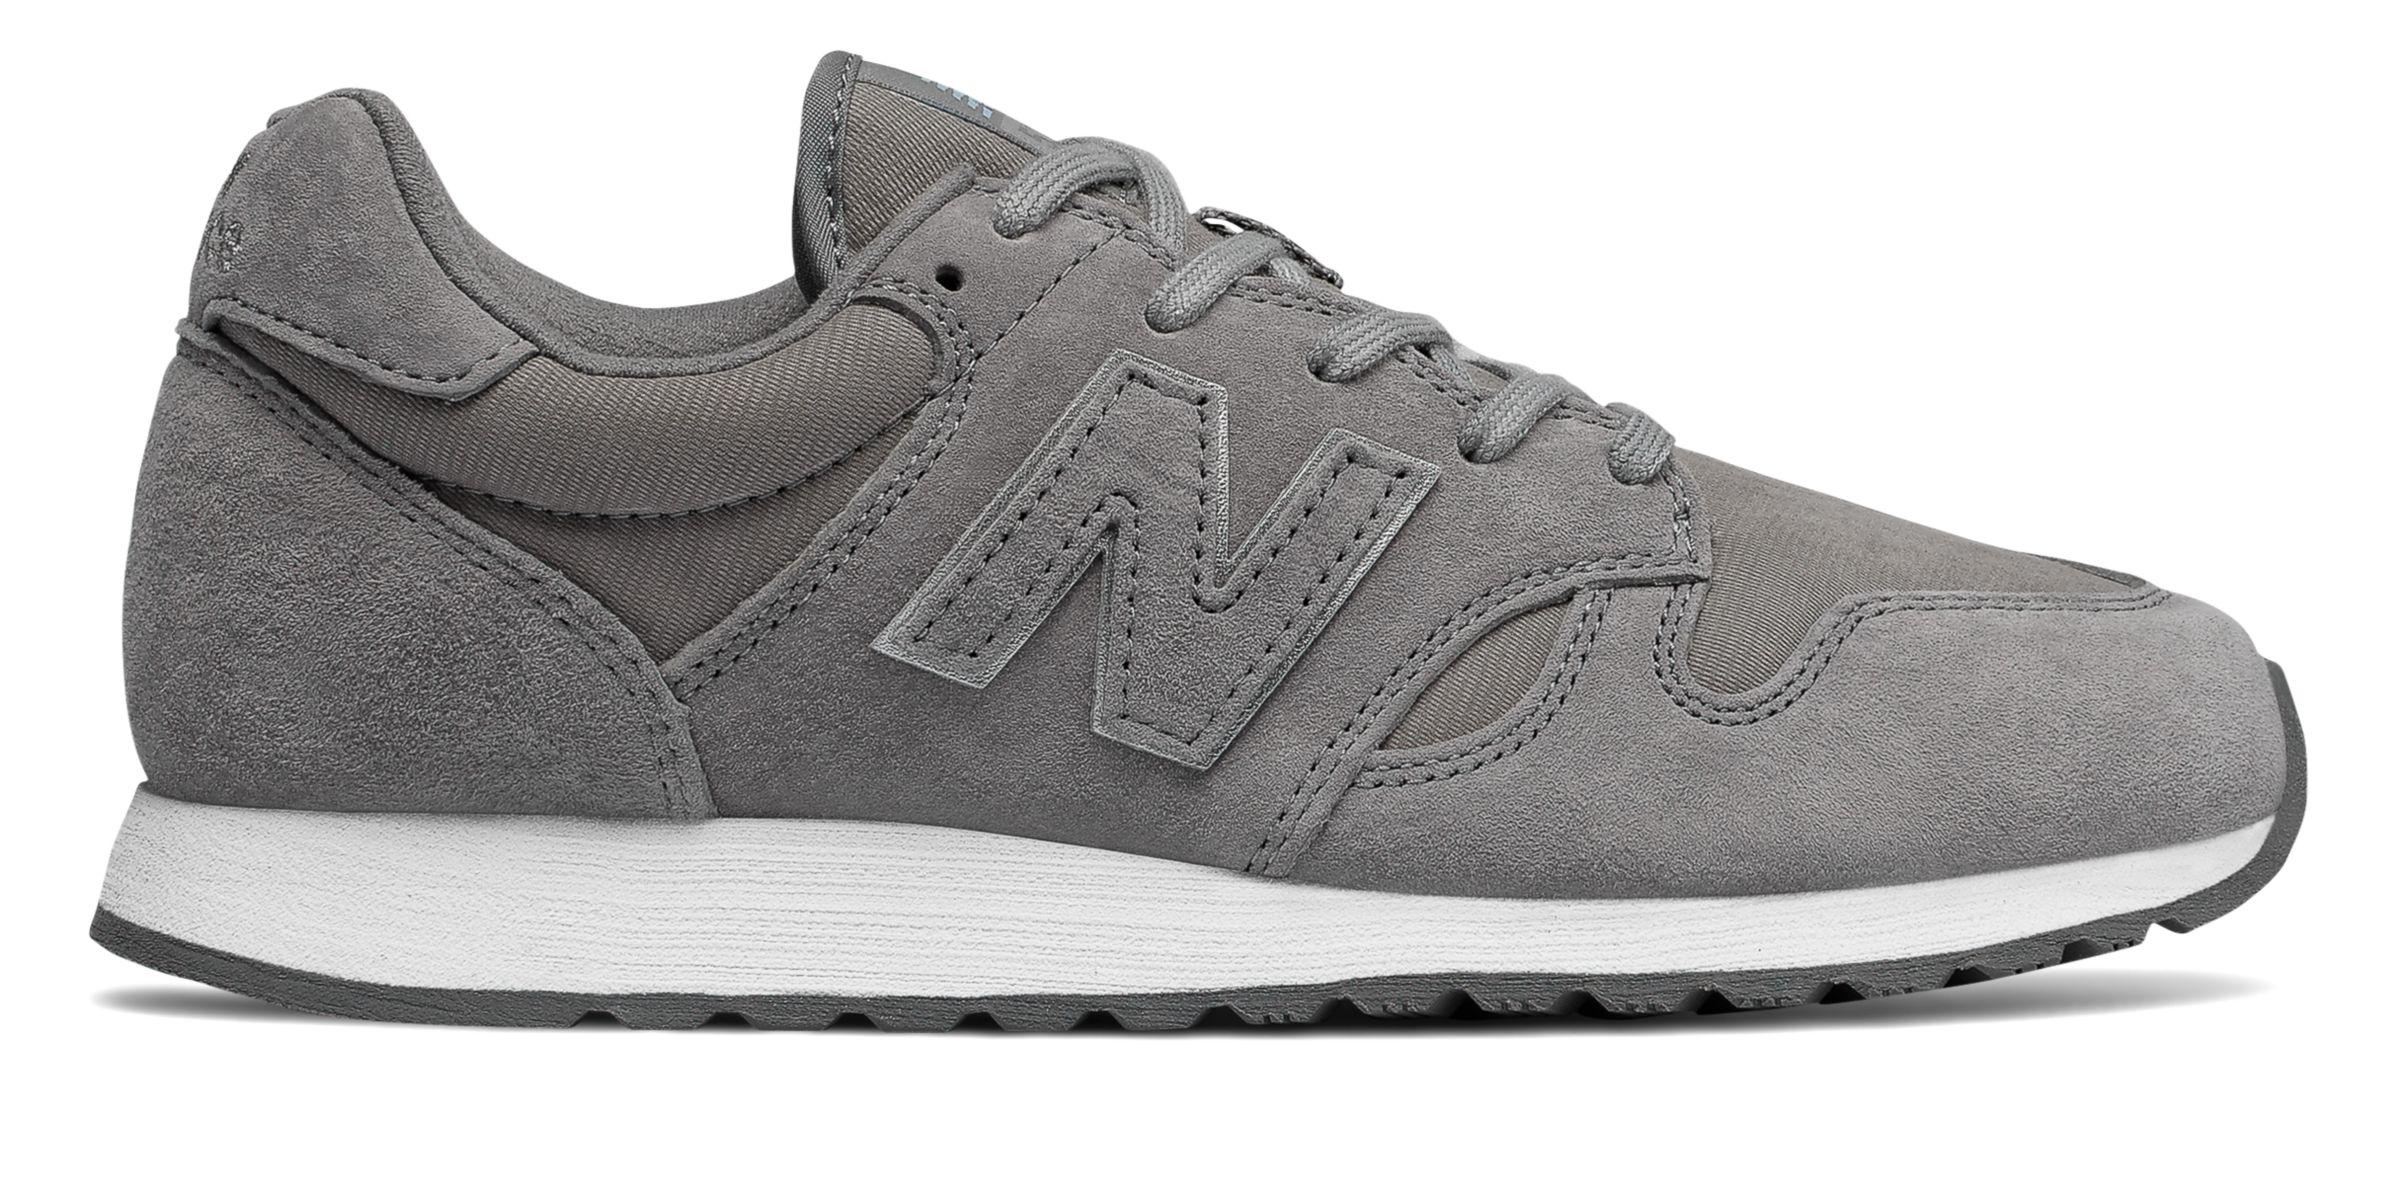 New Balance - NBWL520BKB090 - WL520BK - Color: Negro - Size: 36.5 6W478bKH7Q